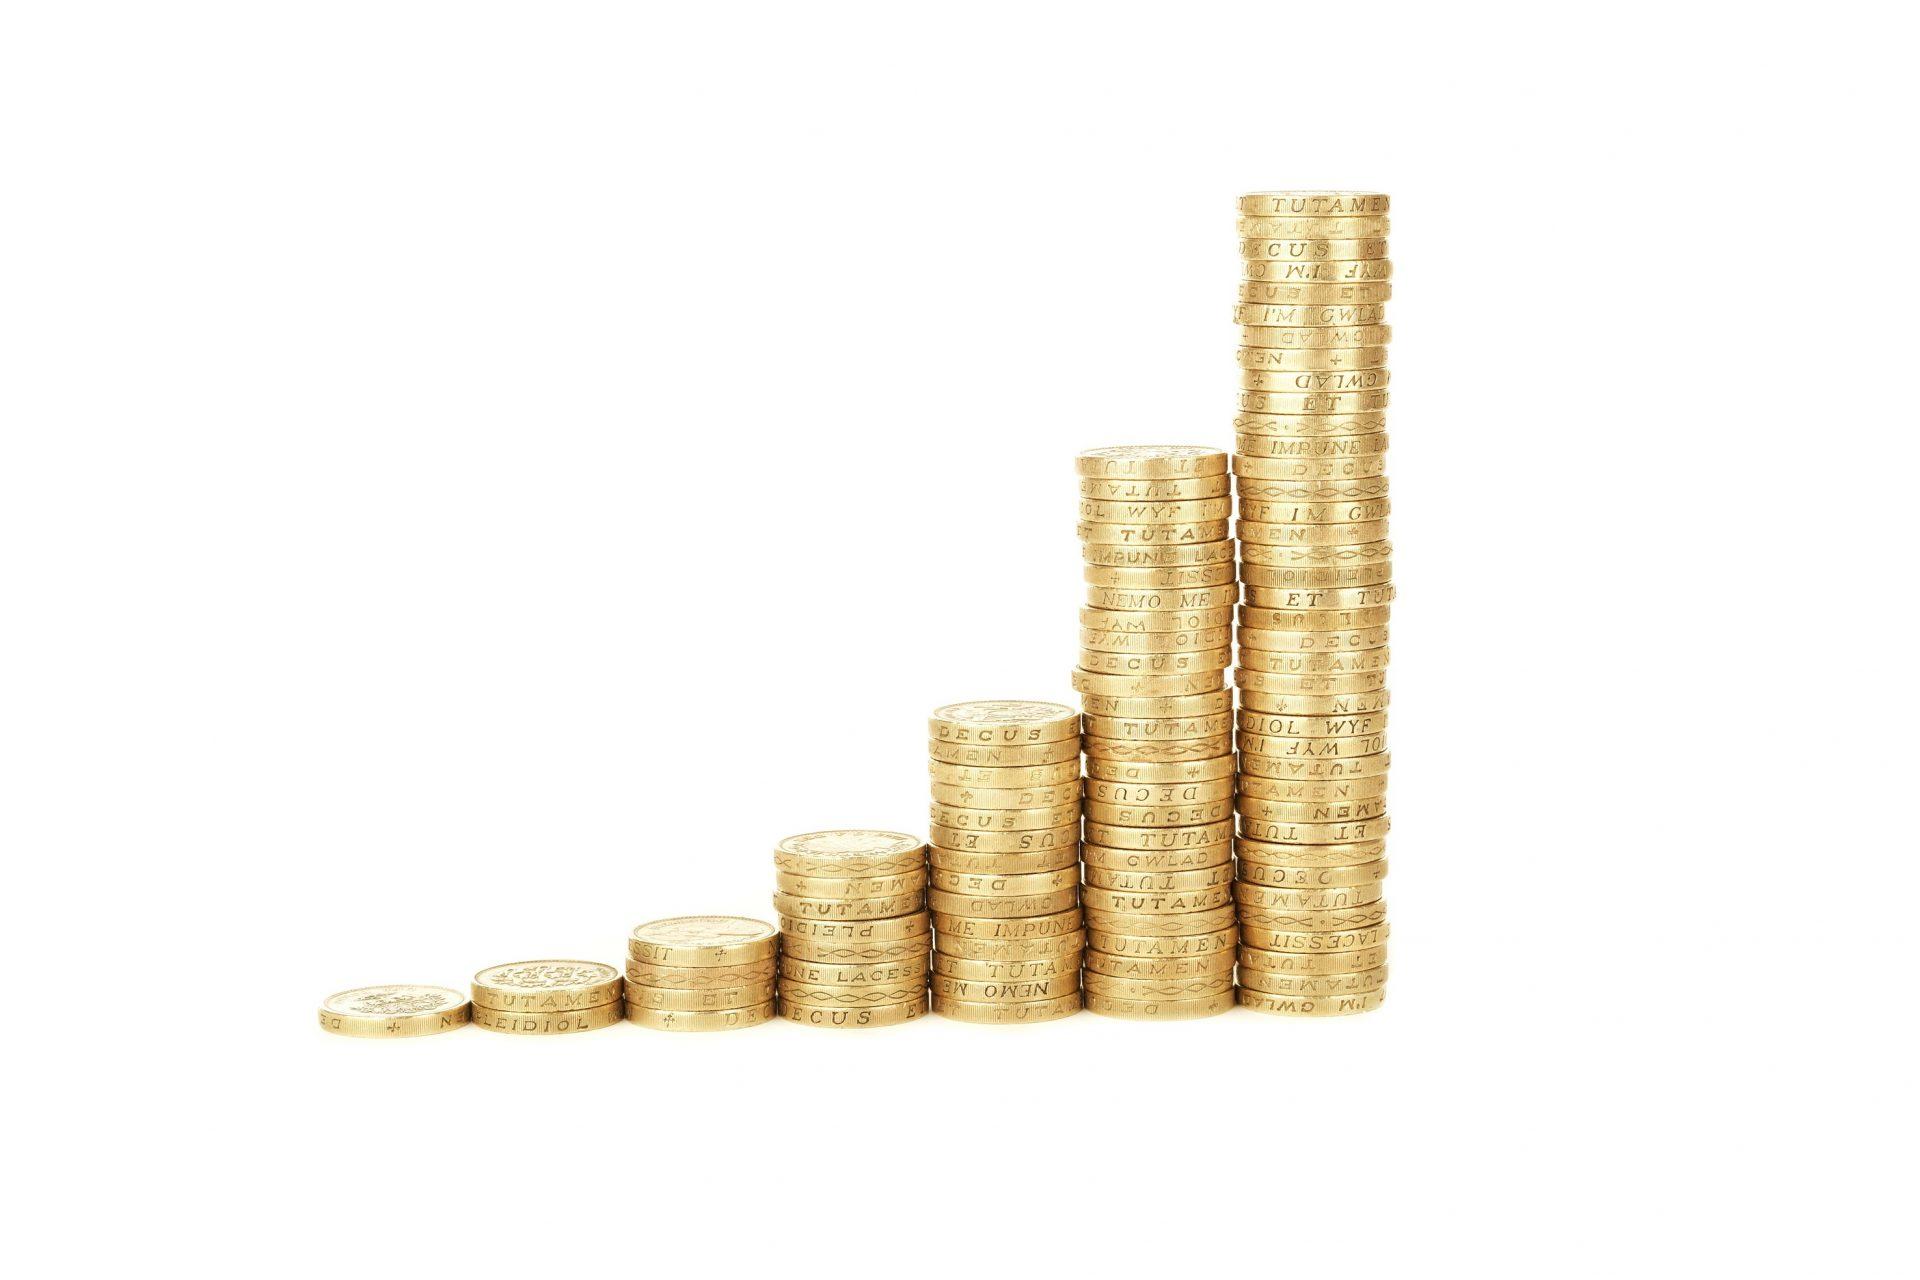 Money increasing in value